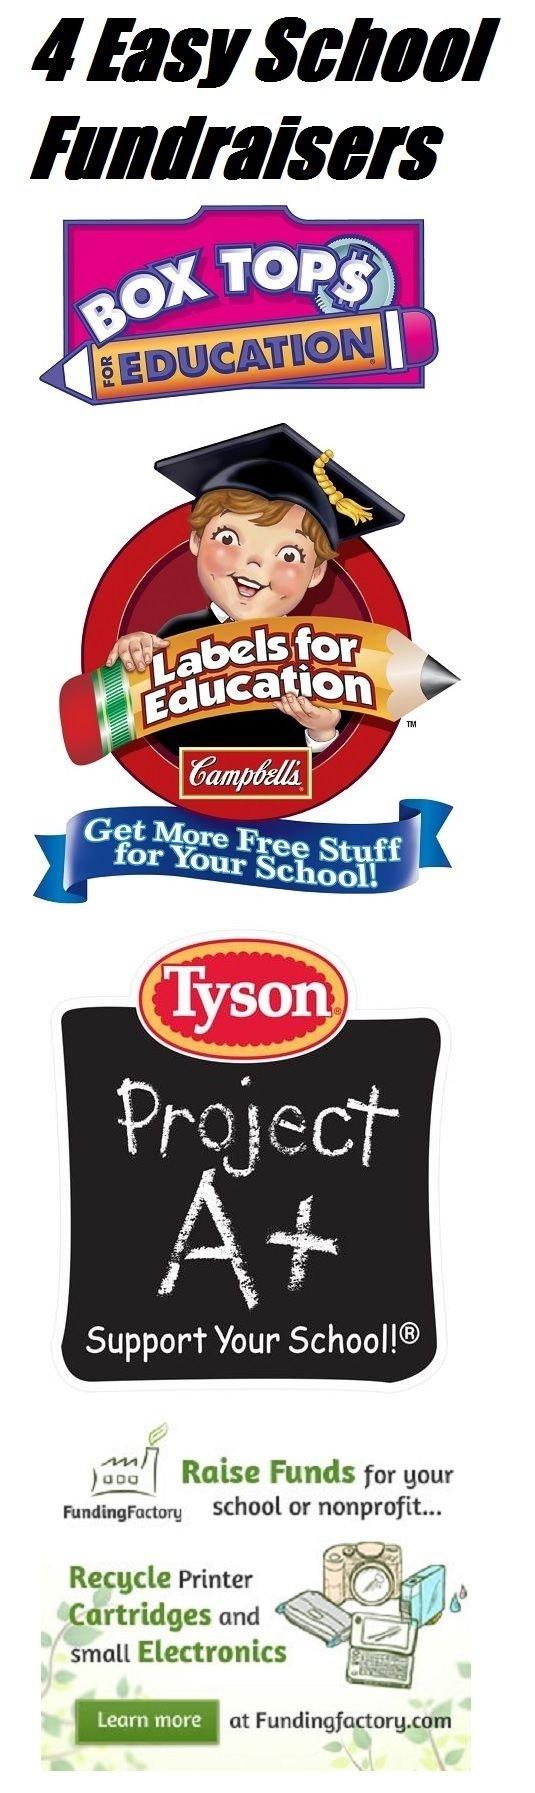 10 Trendy Fun Fundraising Ideas For High School 169 best school fundraising ideas images on pinterest school 3 2020